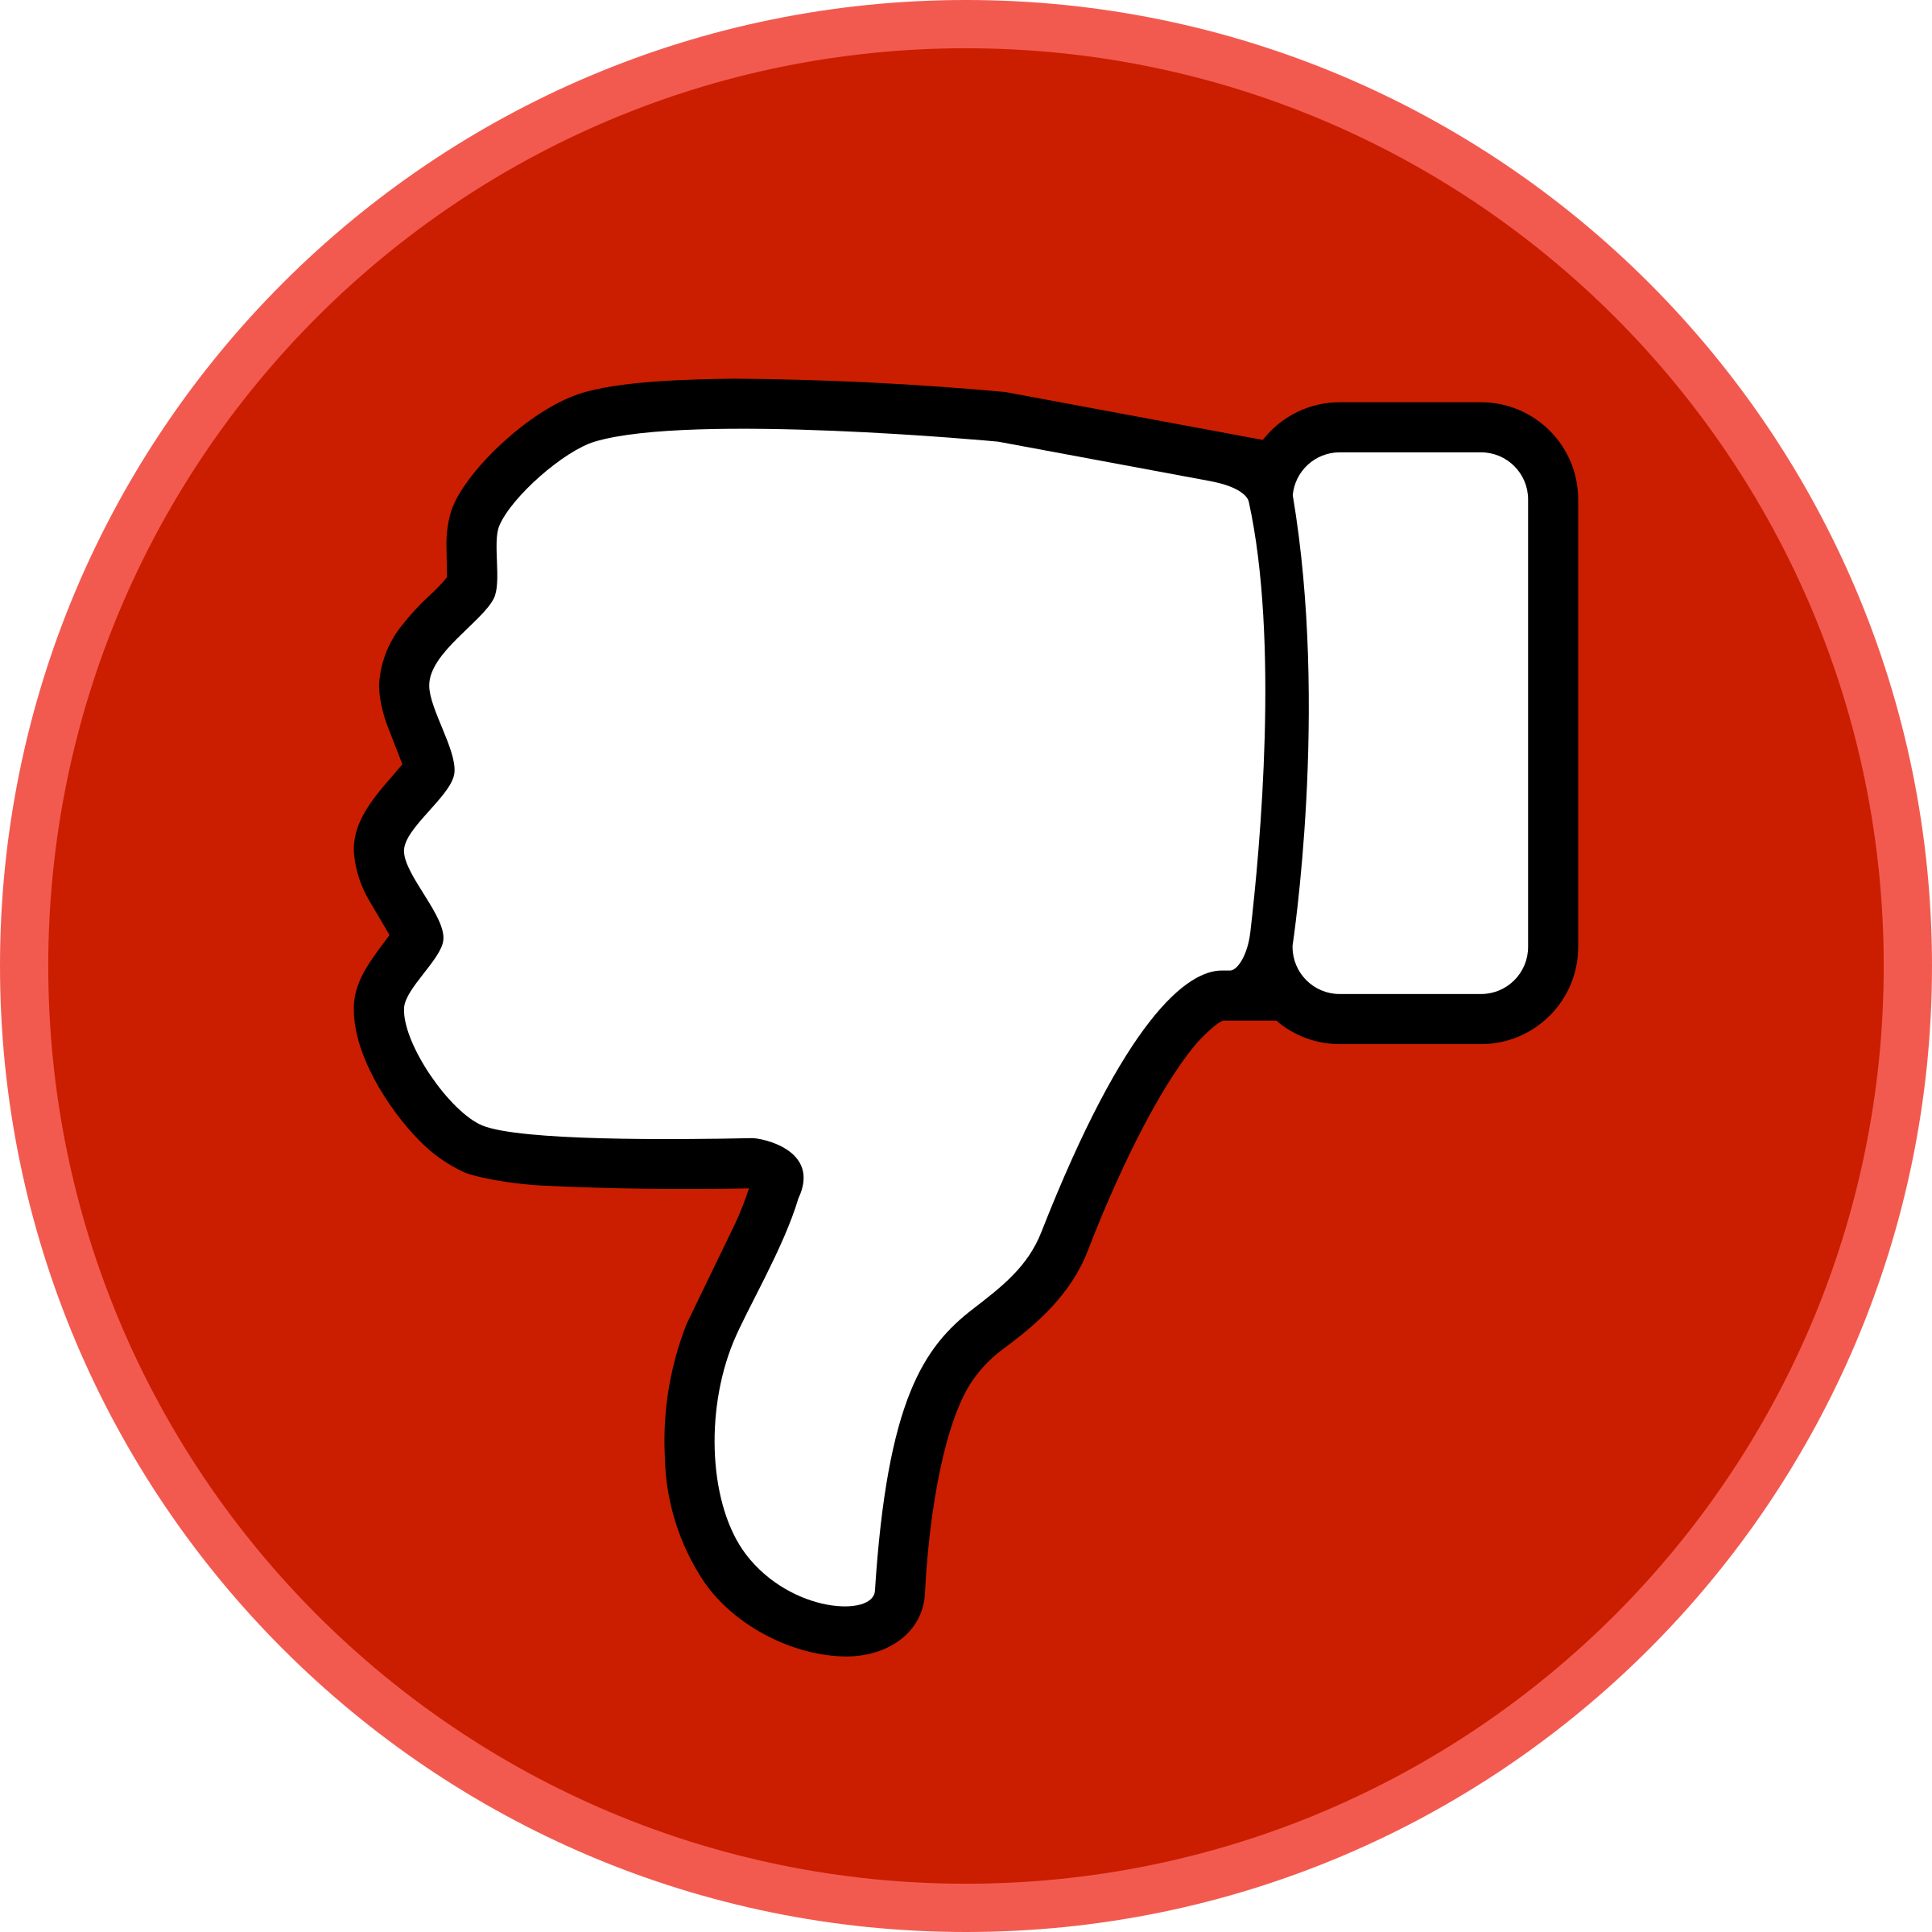 Thumbs Down Circle by j4p4n | Clip art, Emoji, Sticker template